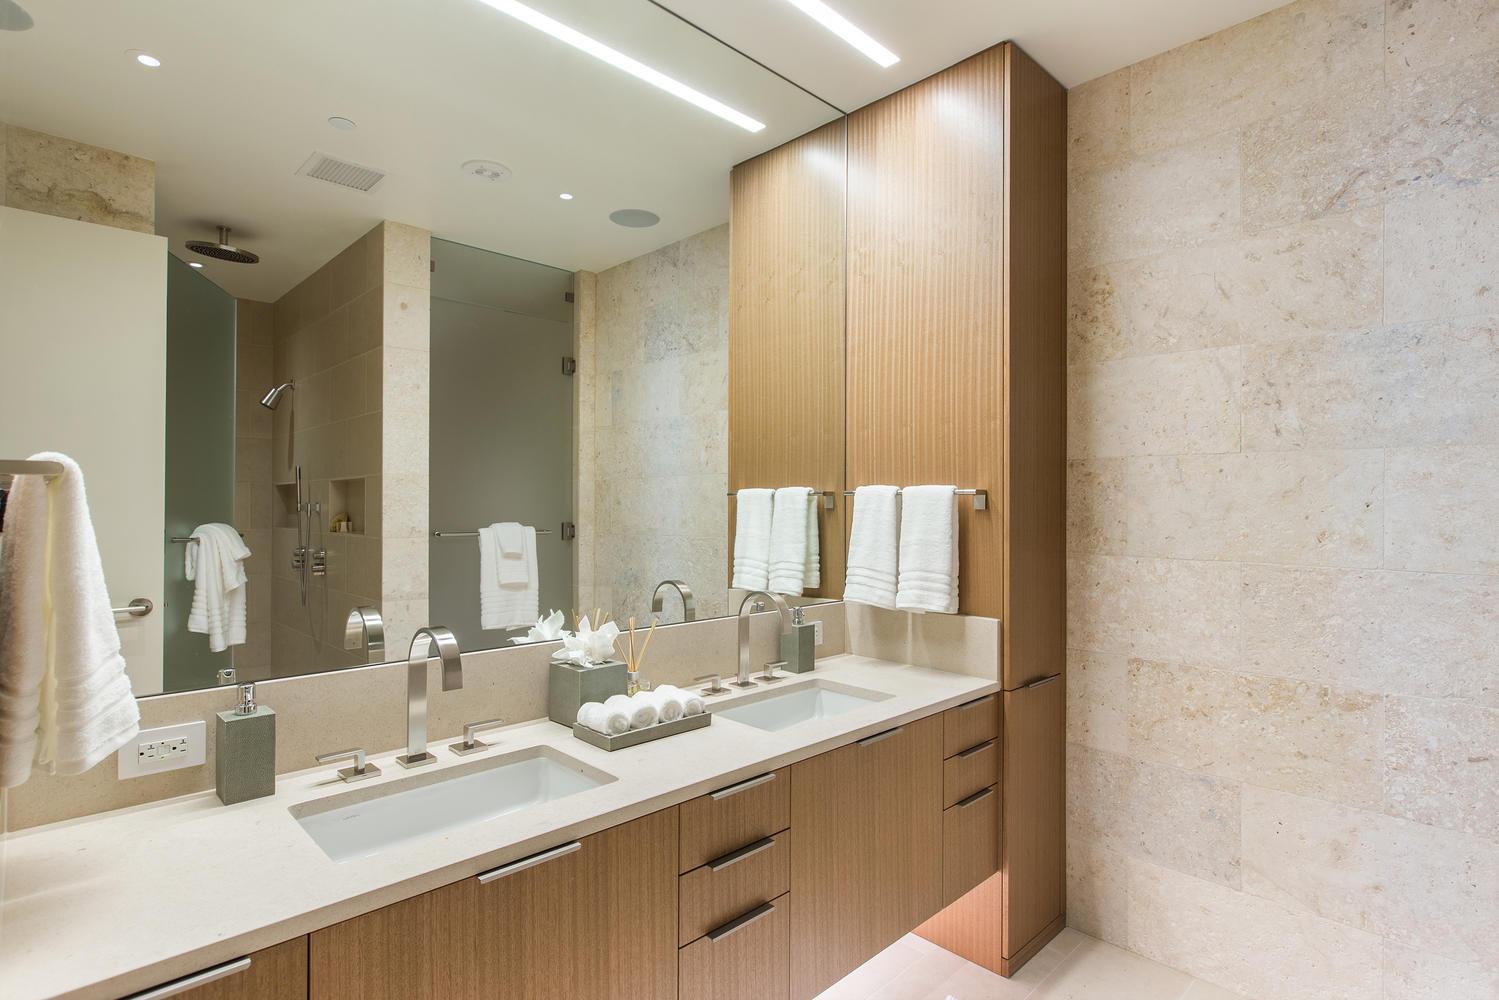 1388 Ala Moana Blvd 7401-large-016-9-Master Suite-1499x1000-72dpi.jpg